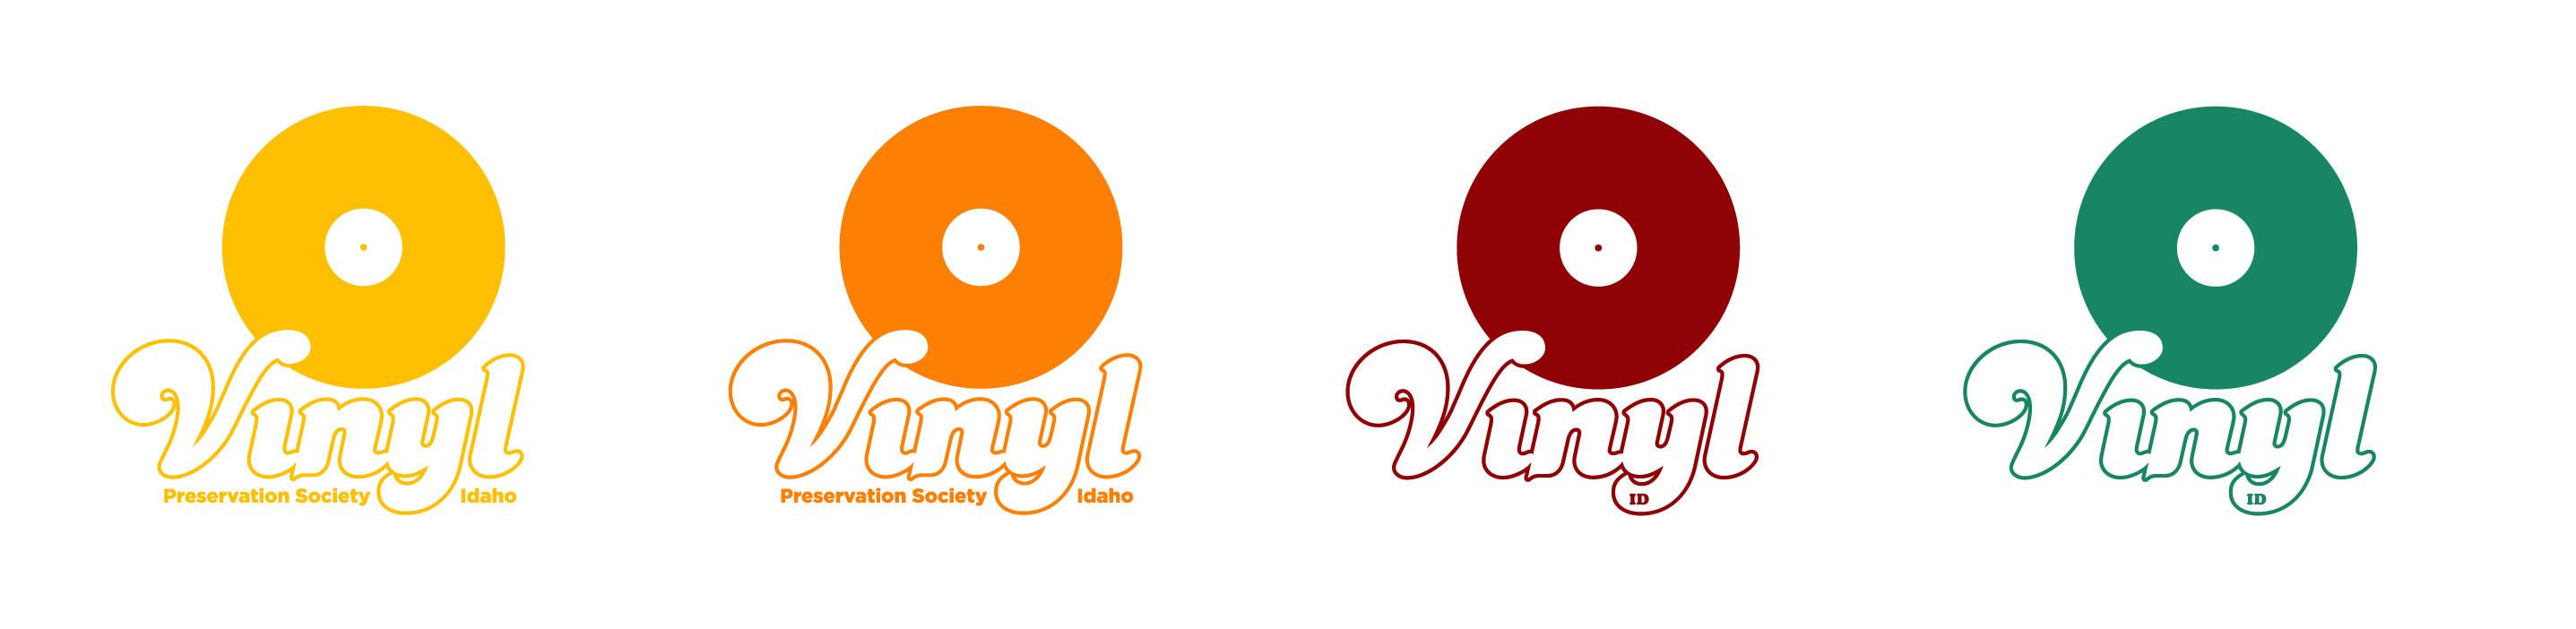 VPS_logo_BW_v2.eps